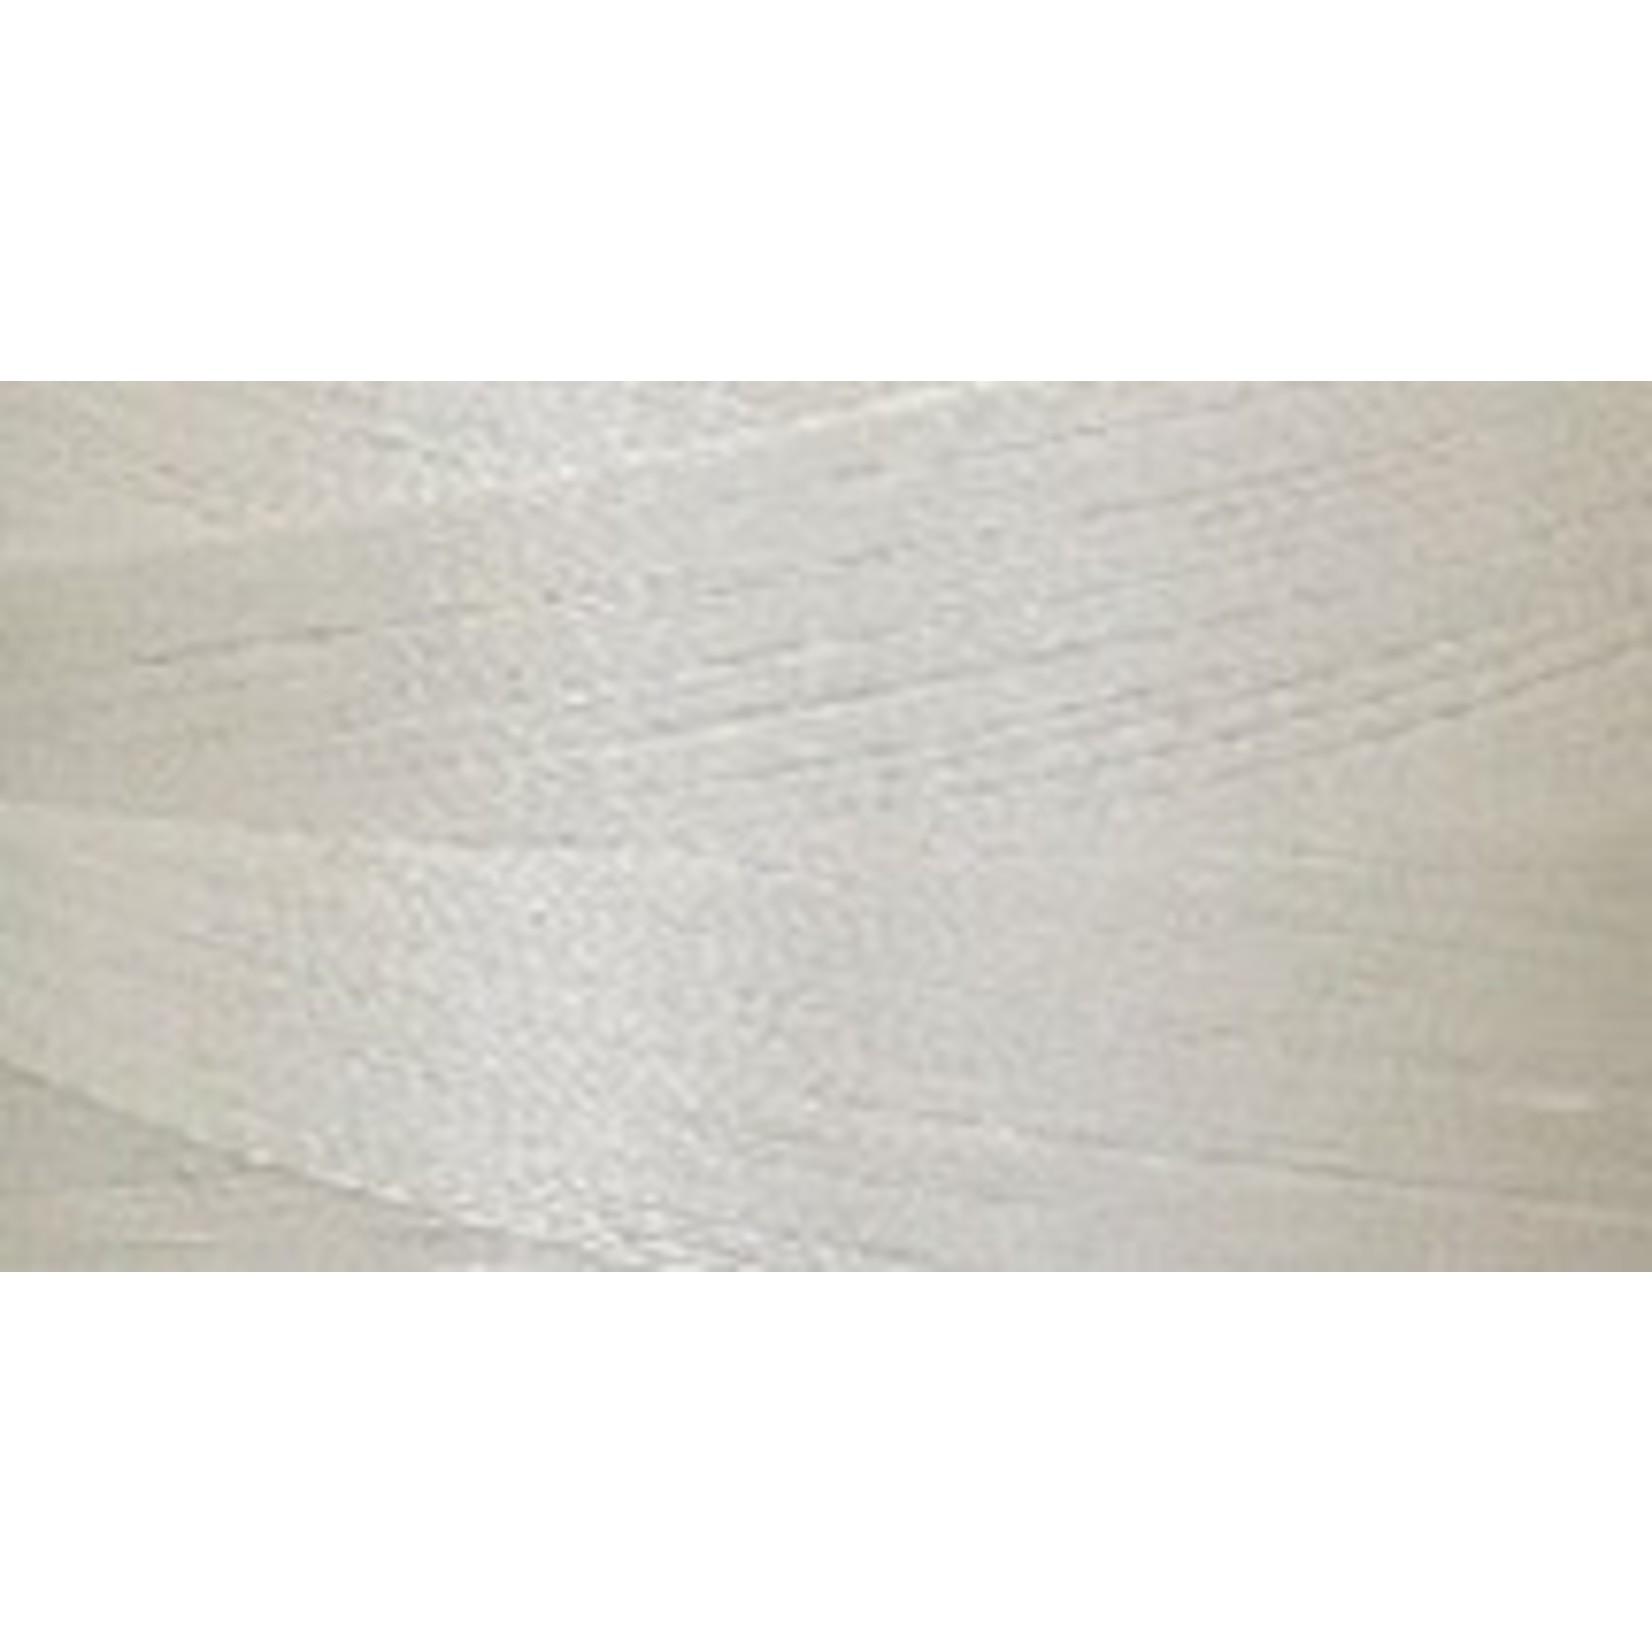 Superior Threads Bottom Line - #60 - 1300 m - 651 Ivory